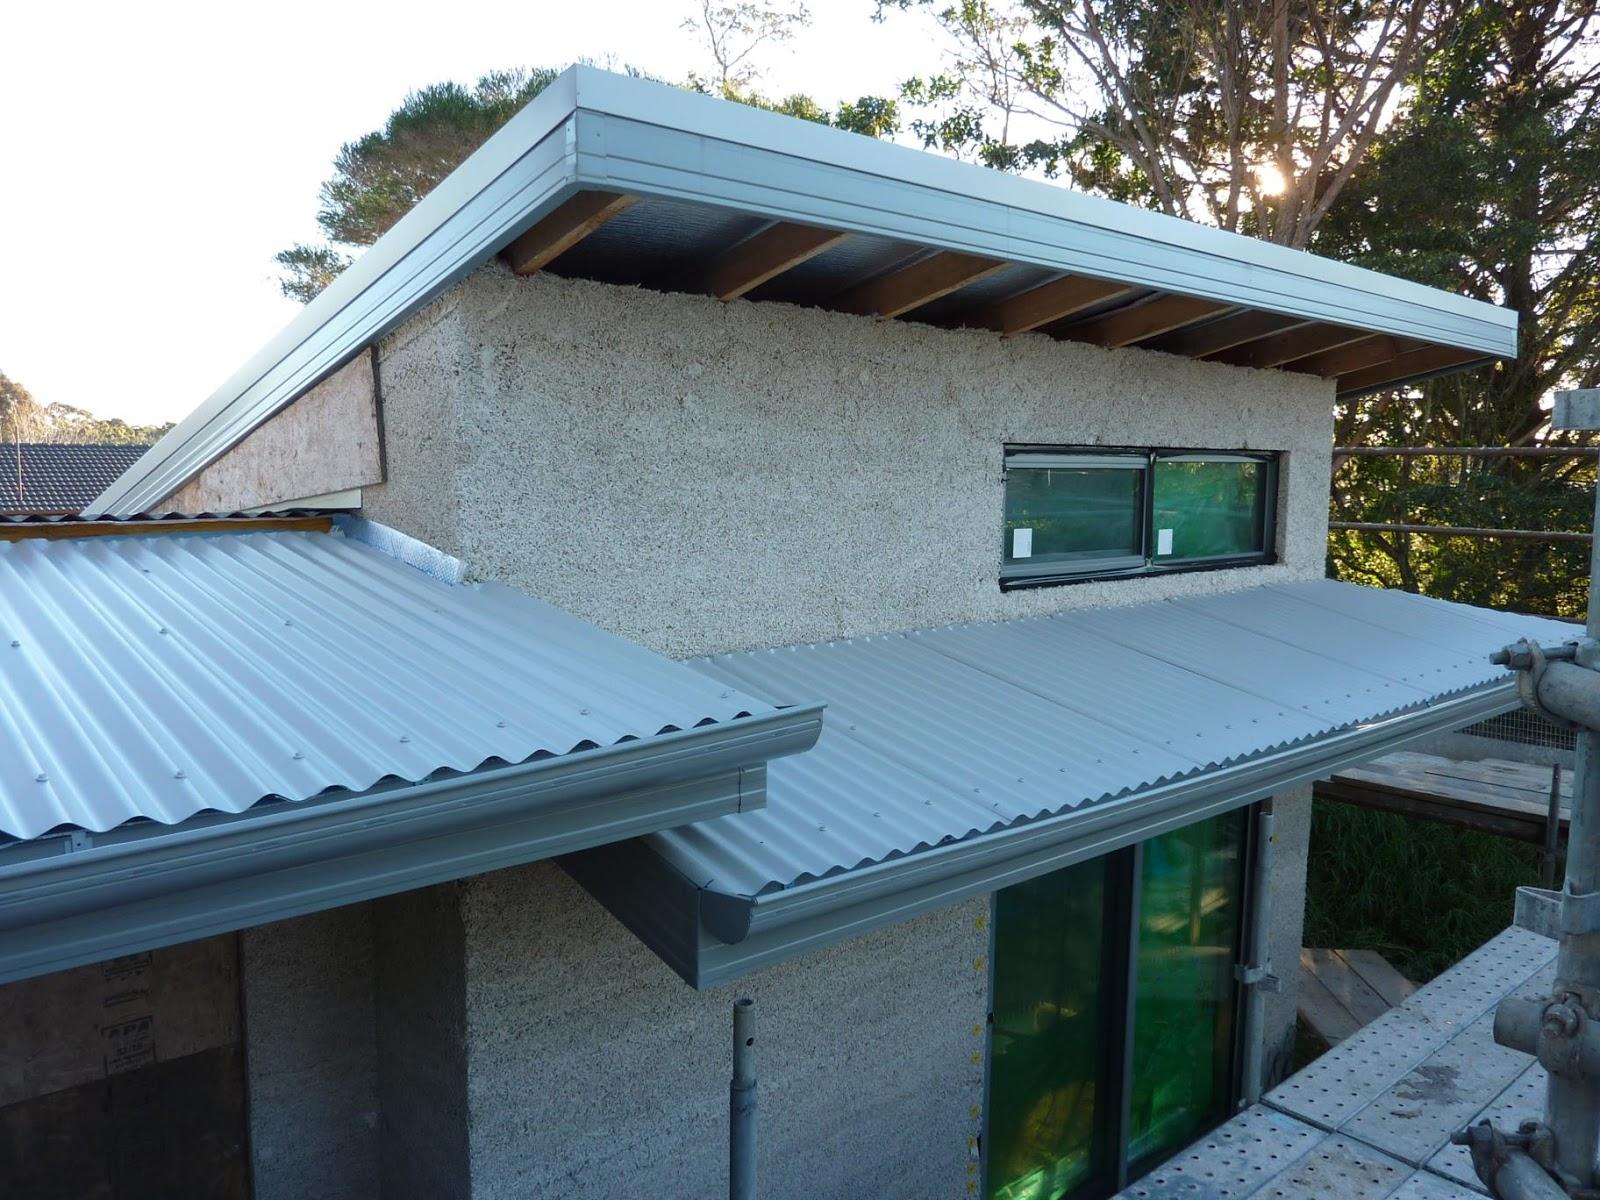 Culburra Hemp House: Awning Roof Goes On